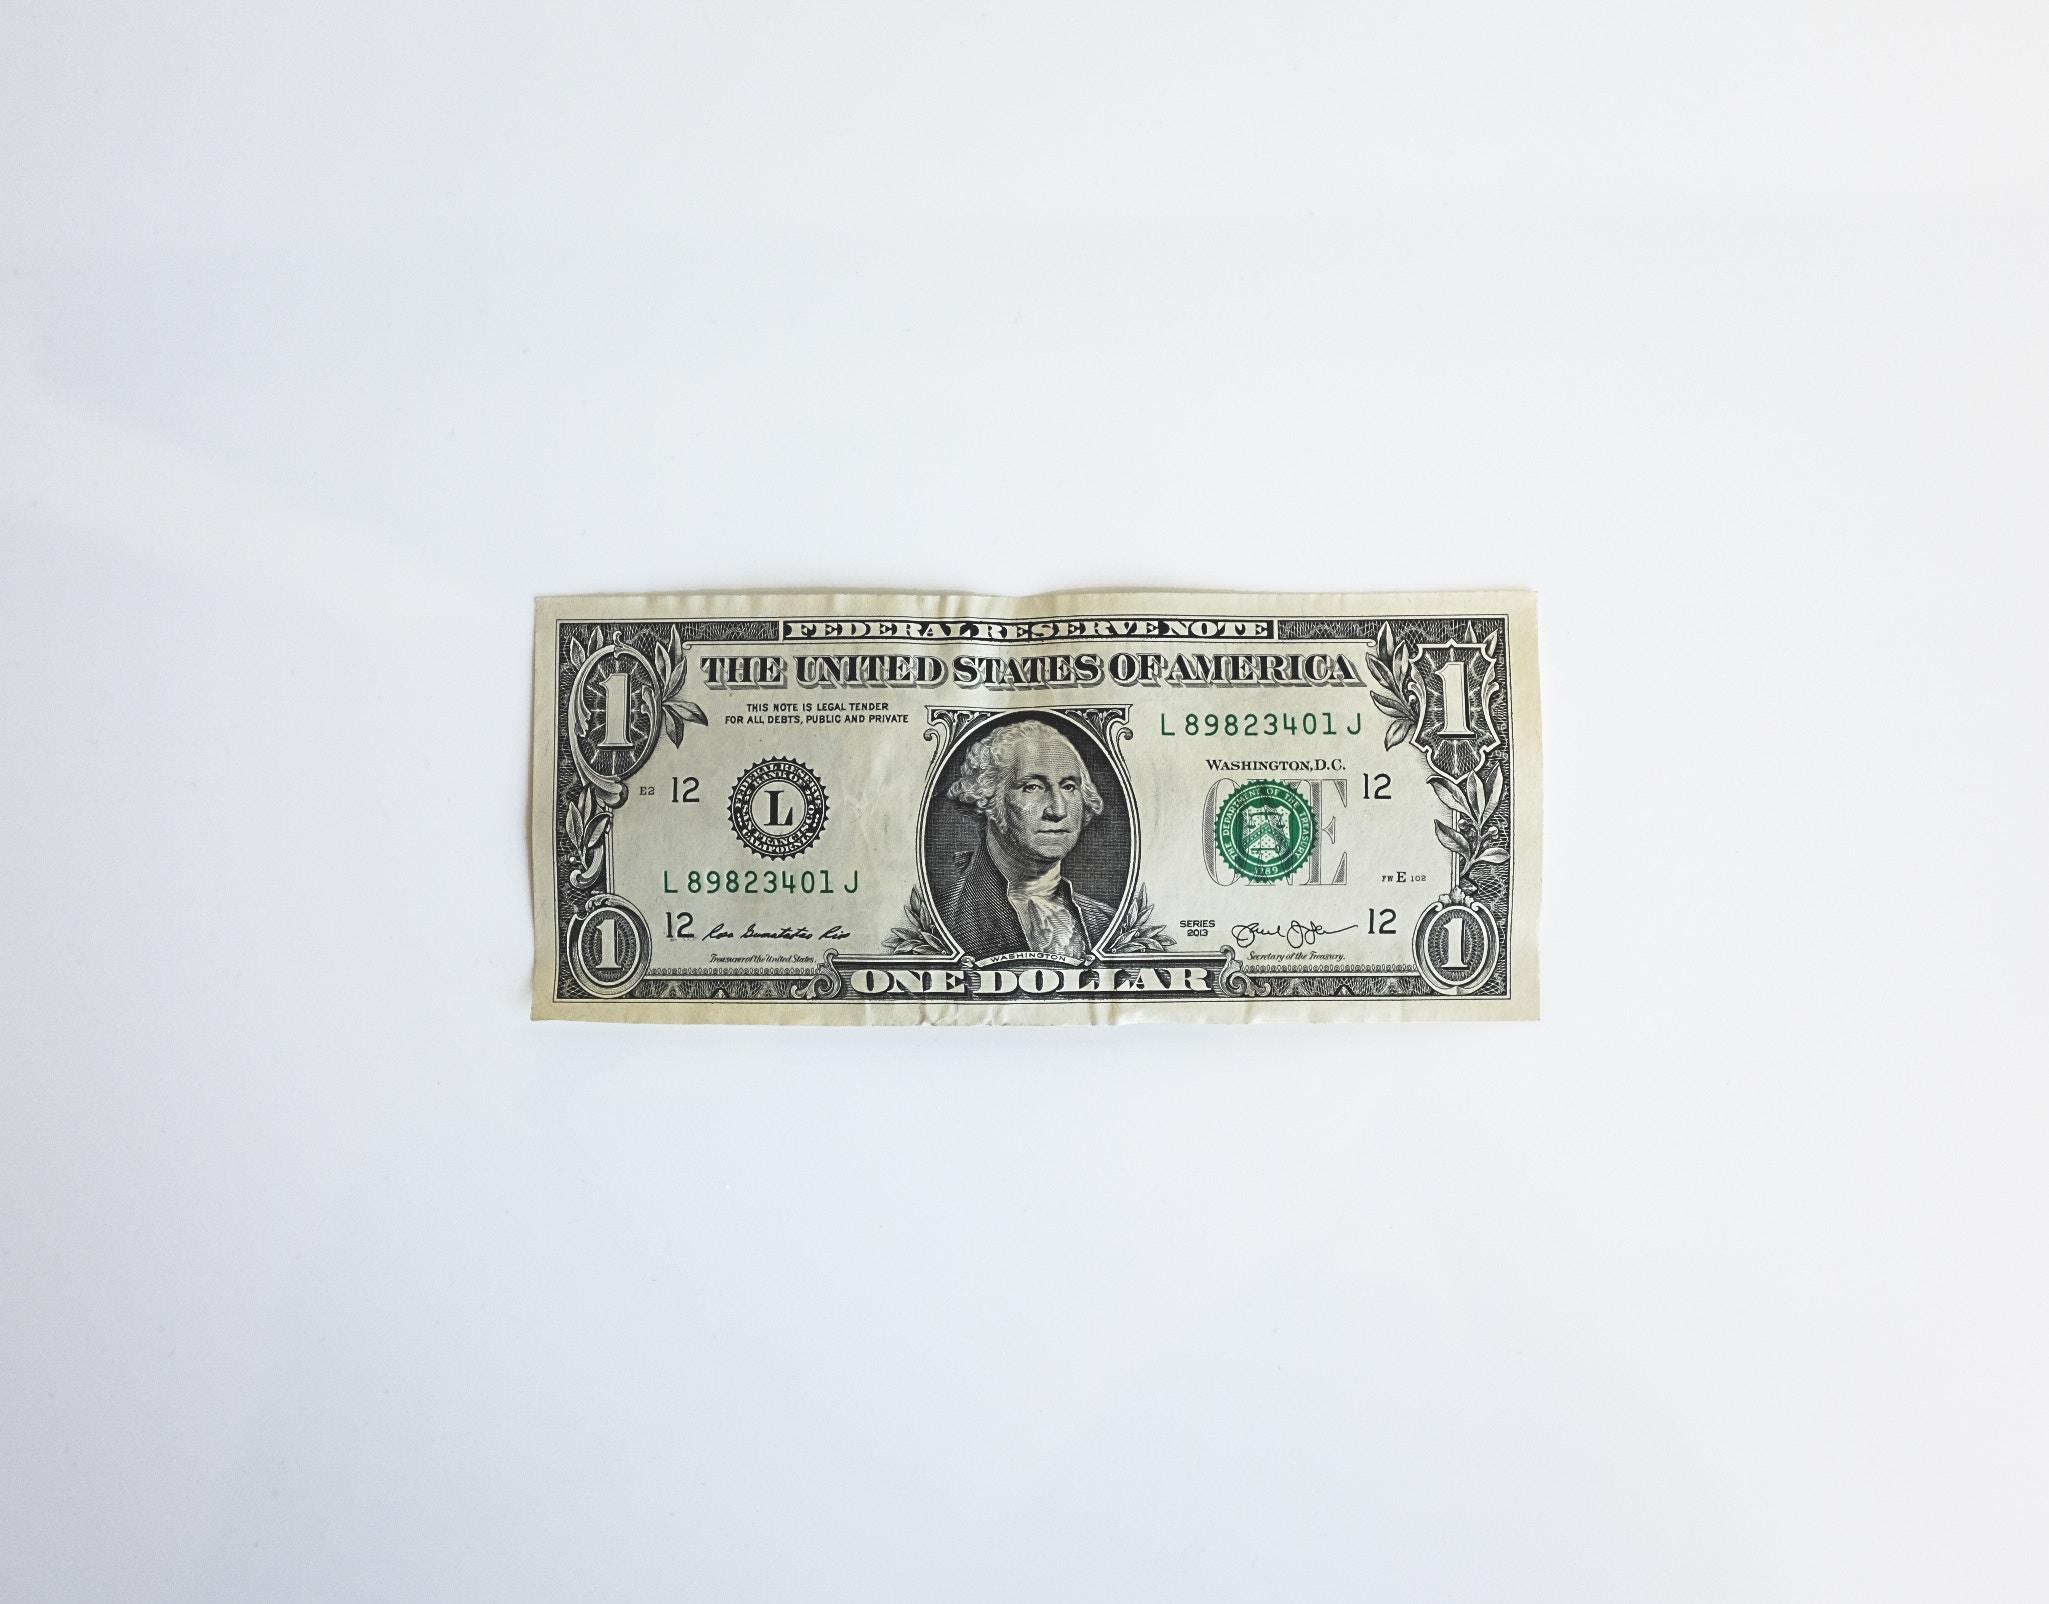 Dollar bill against white background